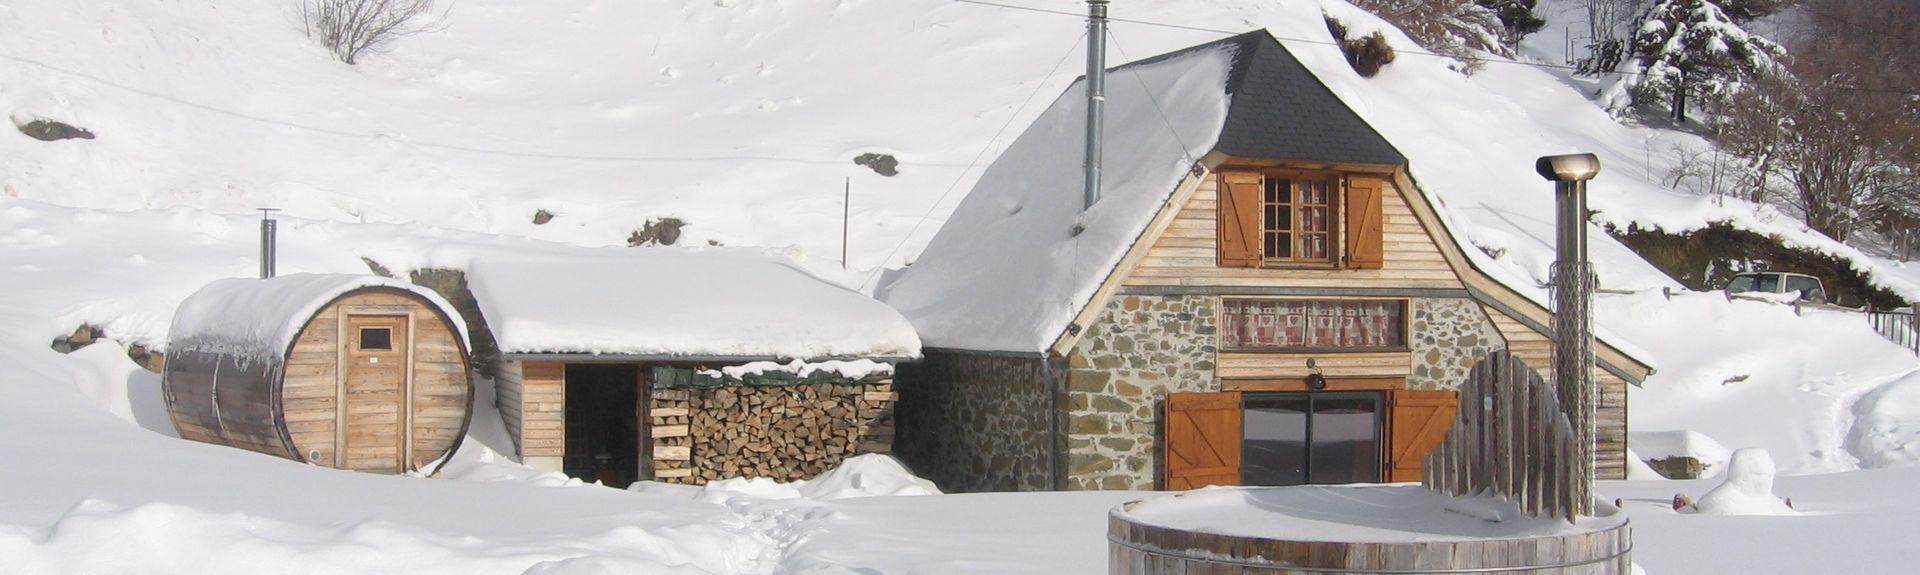 Cier-de-Luchon stasjon, Cier-de-Luchon, Occitanie, Frankrike